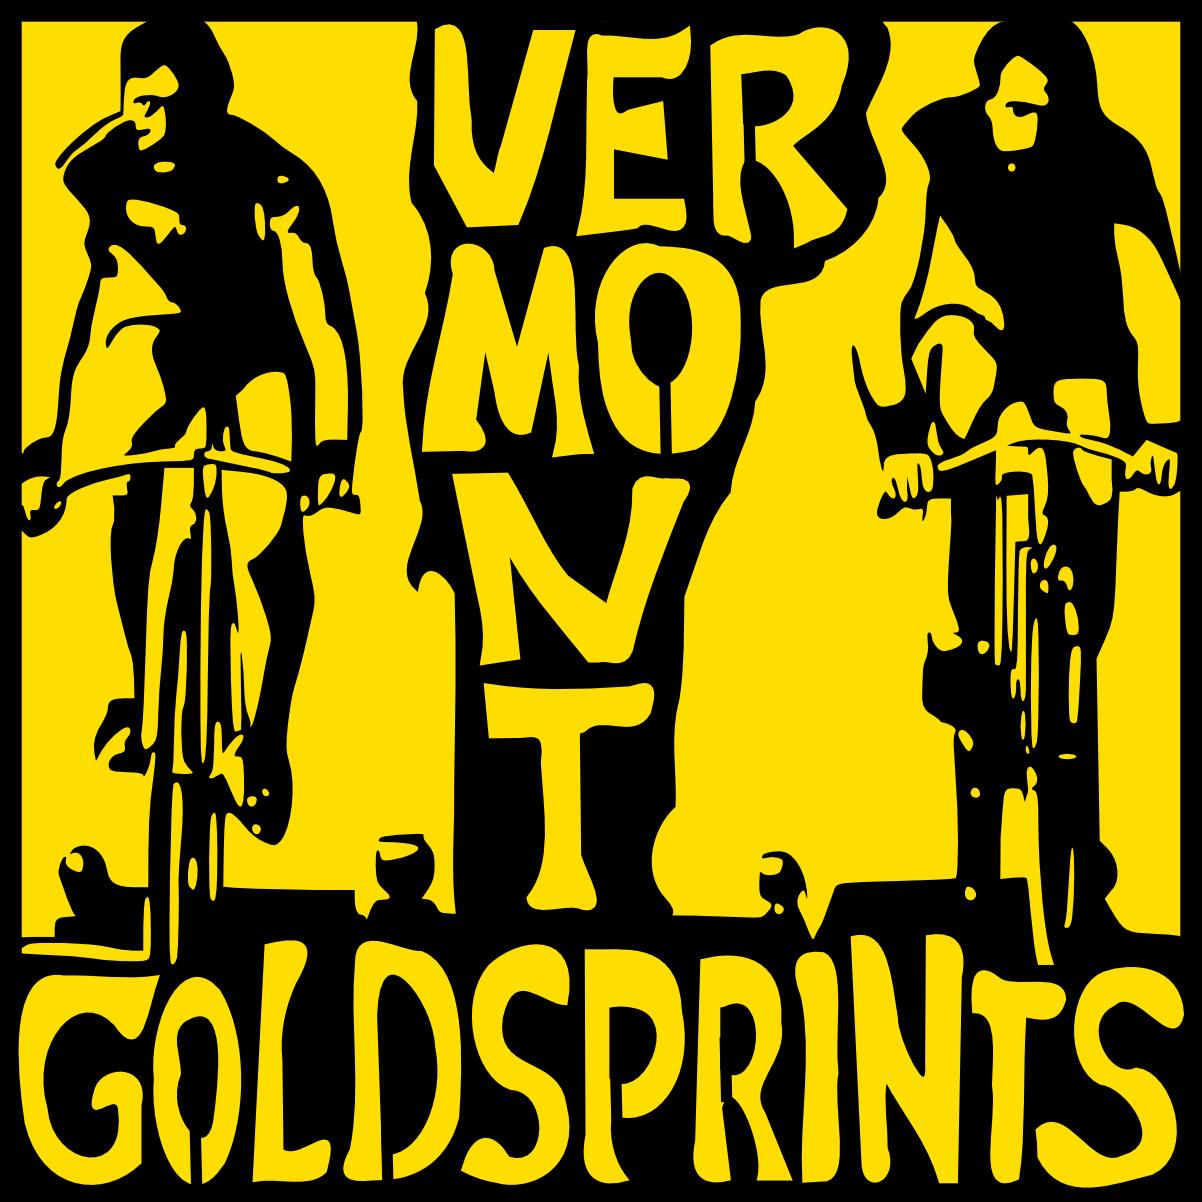 vtgoldsprints2015-stencil2_yellow.png